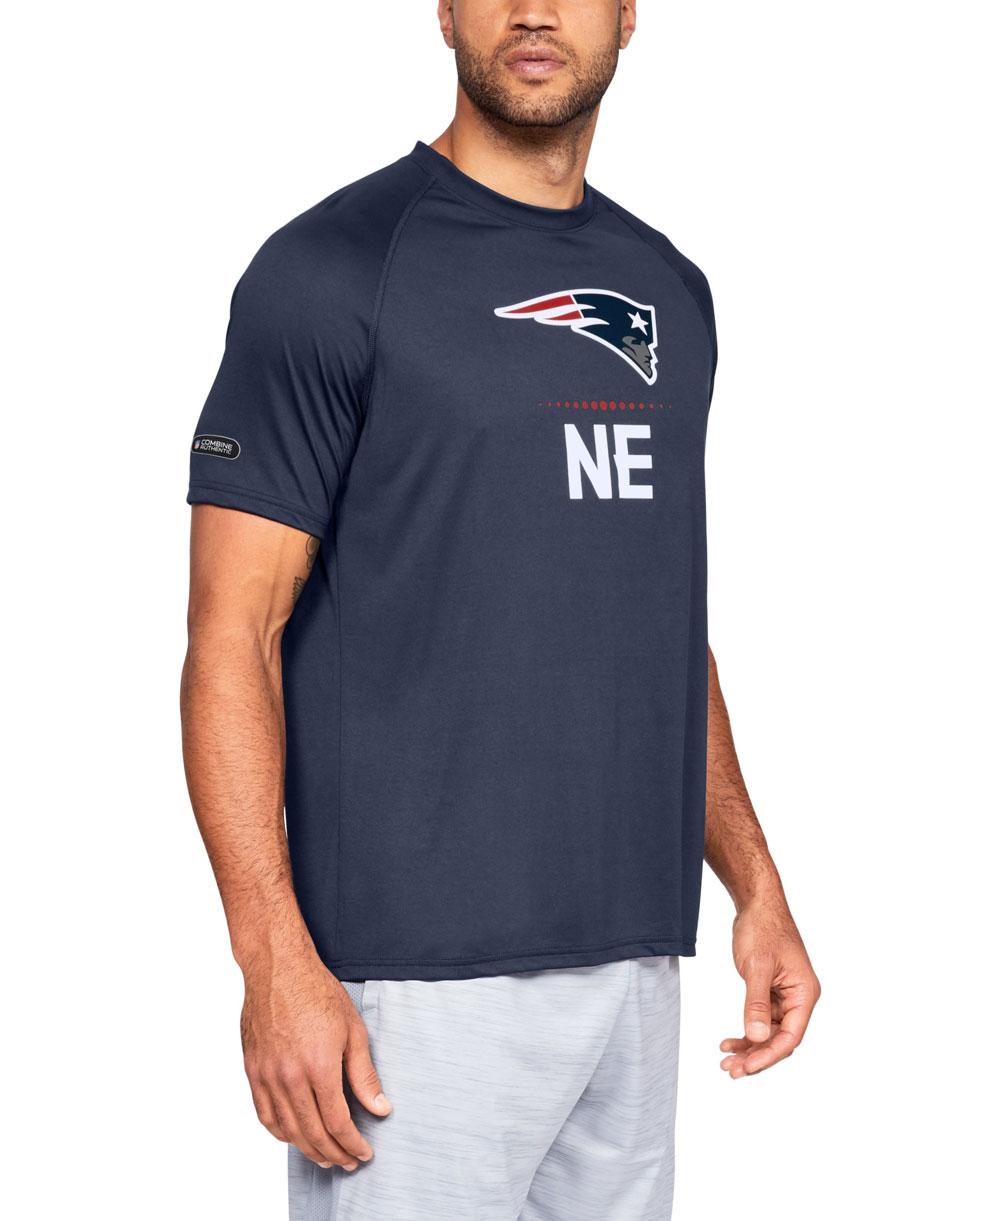 482035652 Men s Short Sleeve T-Shirt NFL Combine Authentic UA Tech Lockup New England  Patriots